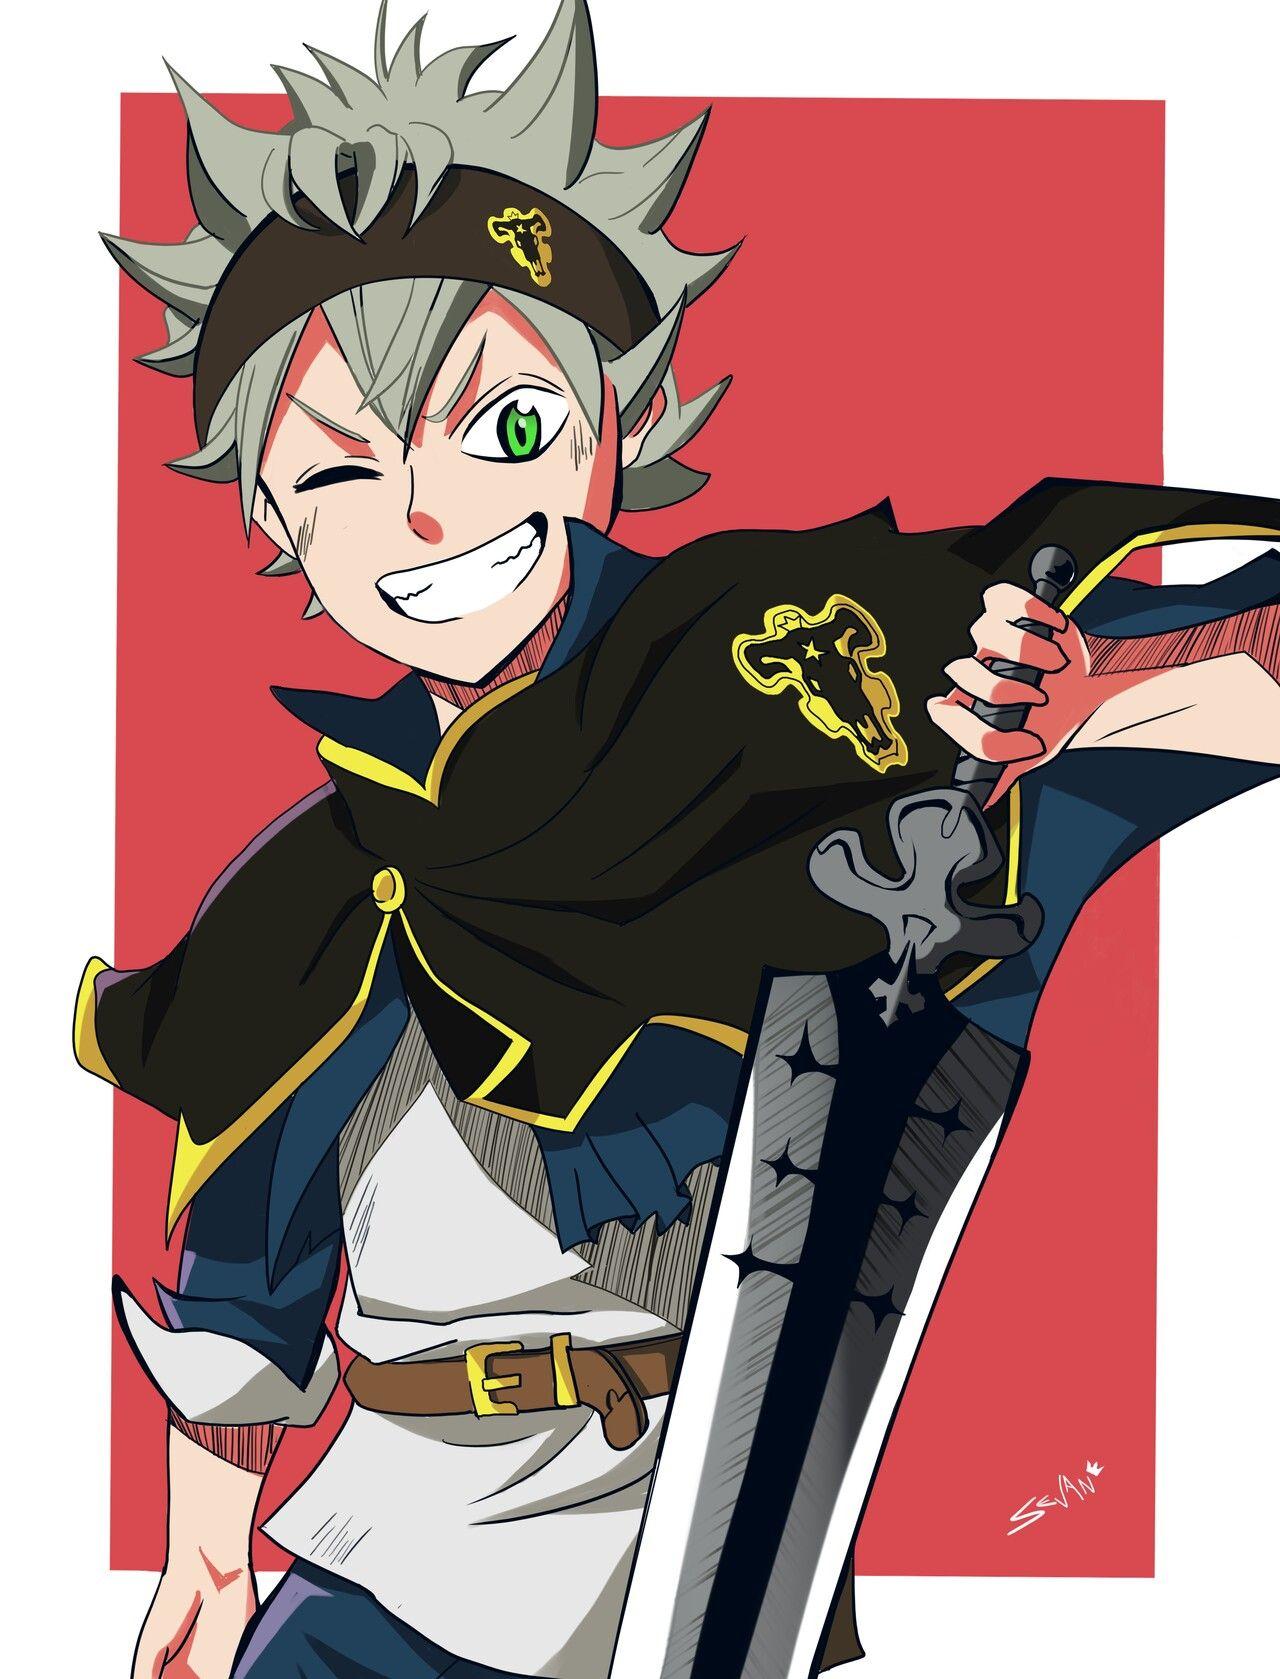 Asta Black Clover Anime Desenhos De Anime Naruto Manga Colorido Ore wa mada, honki o dashite inai. asta black clover anime desenhos